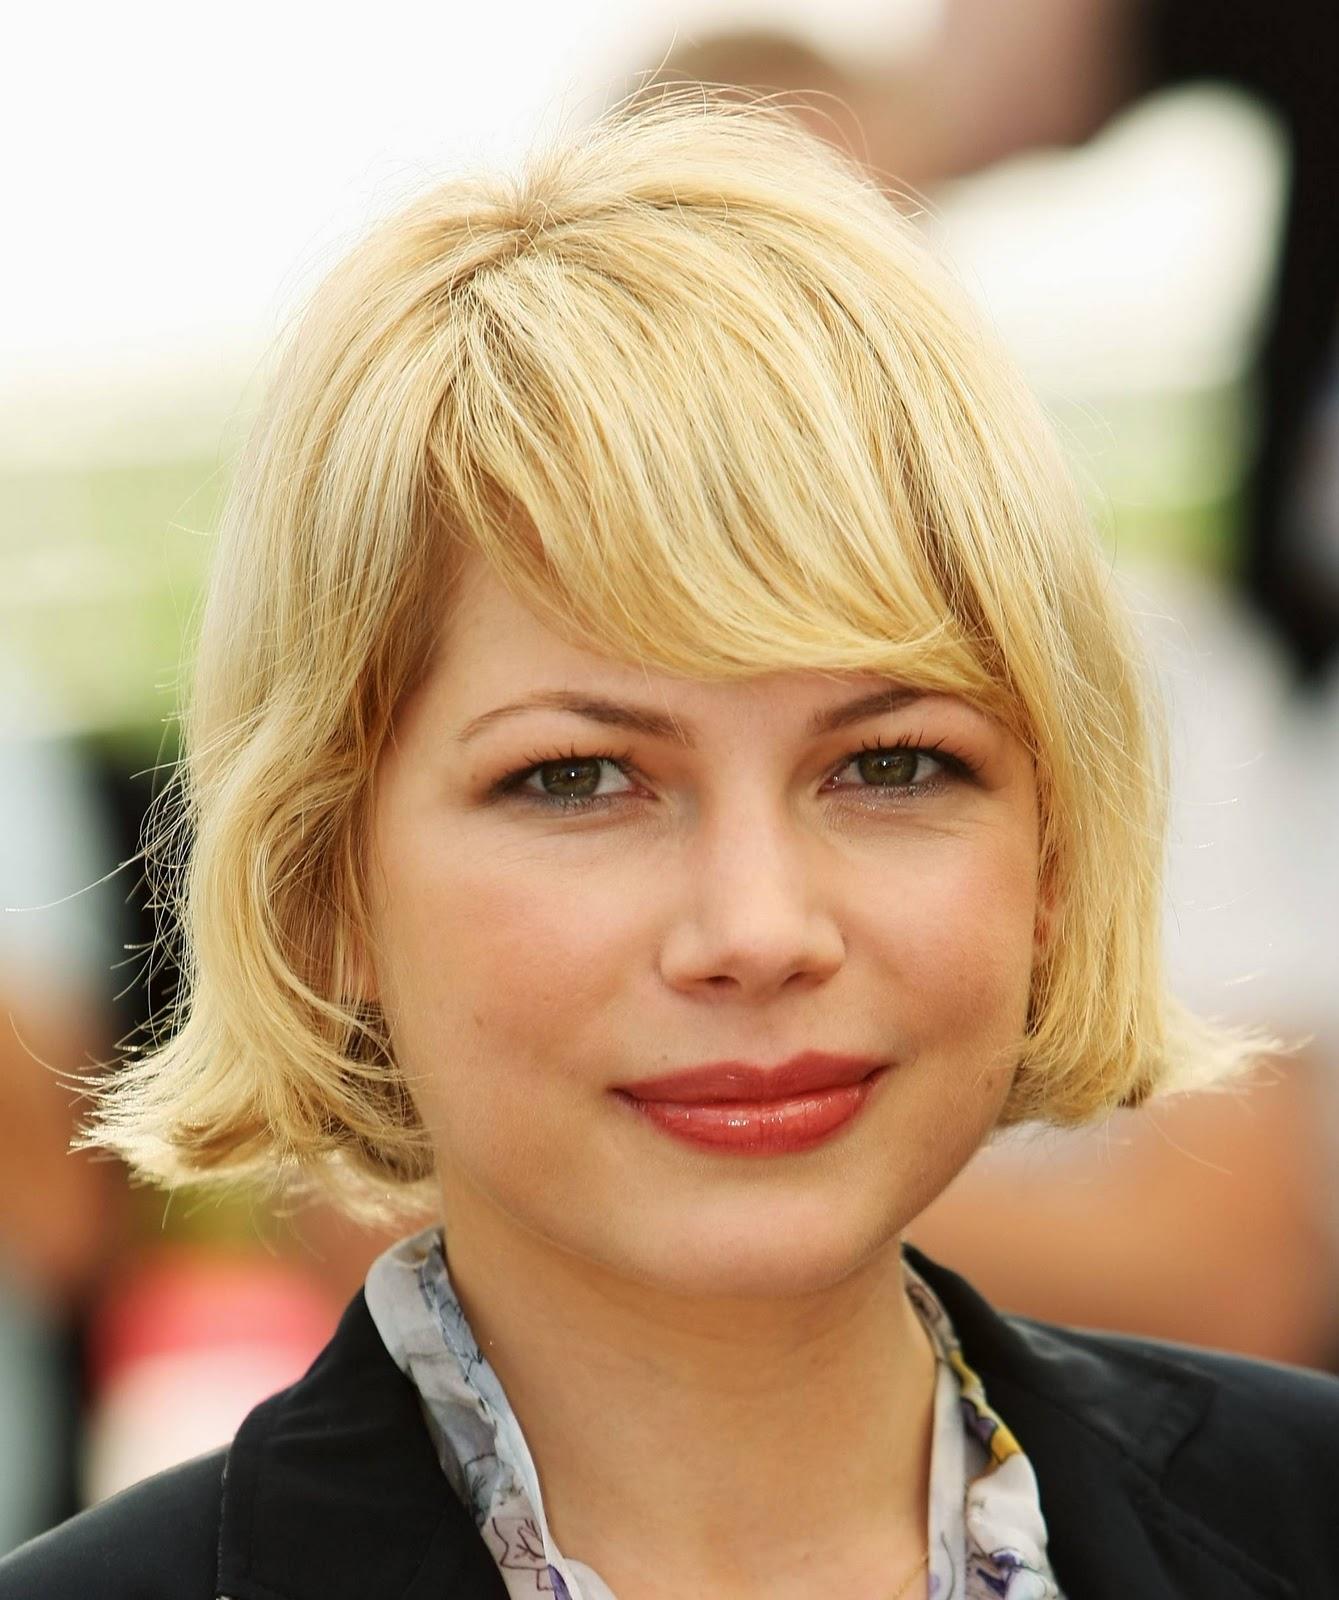 блондинки с короткой стрижкой картинки